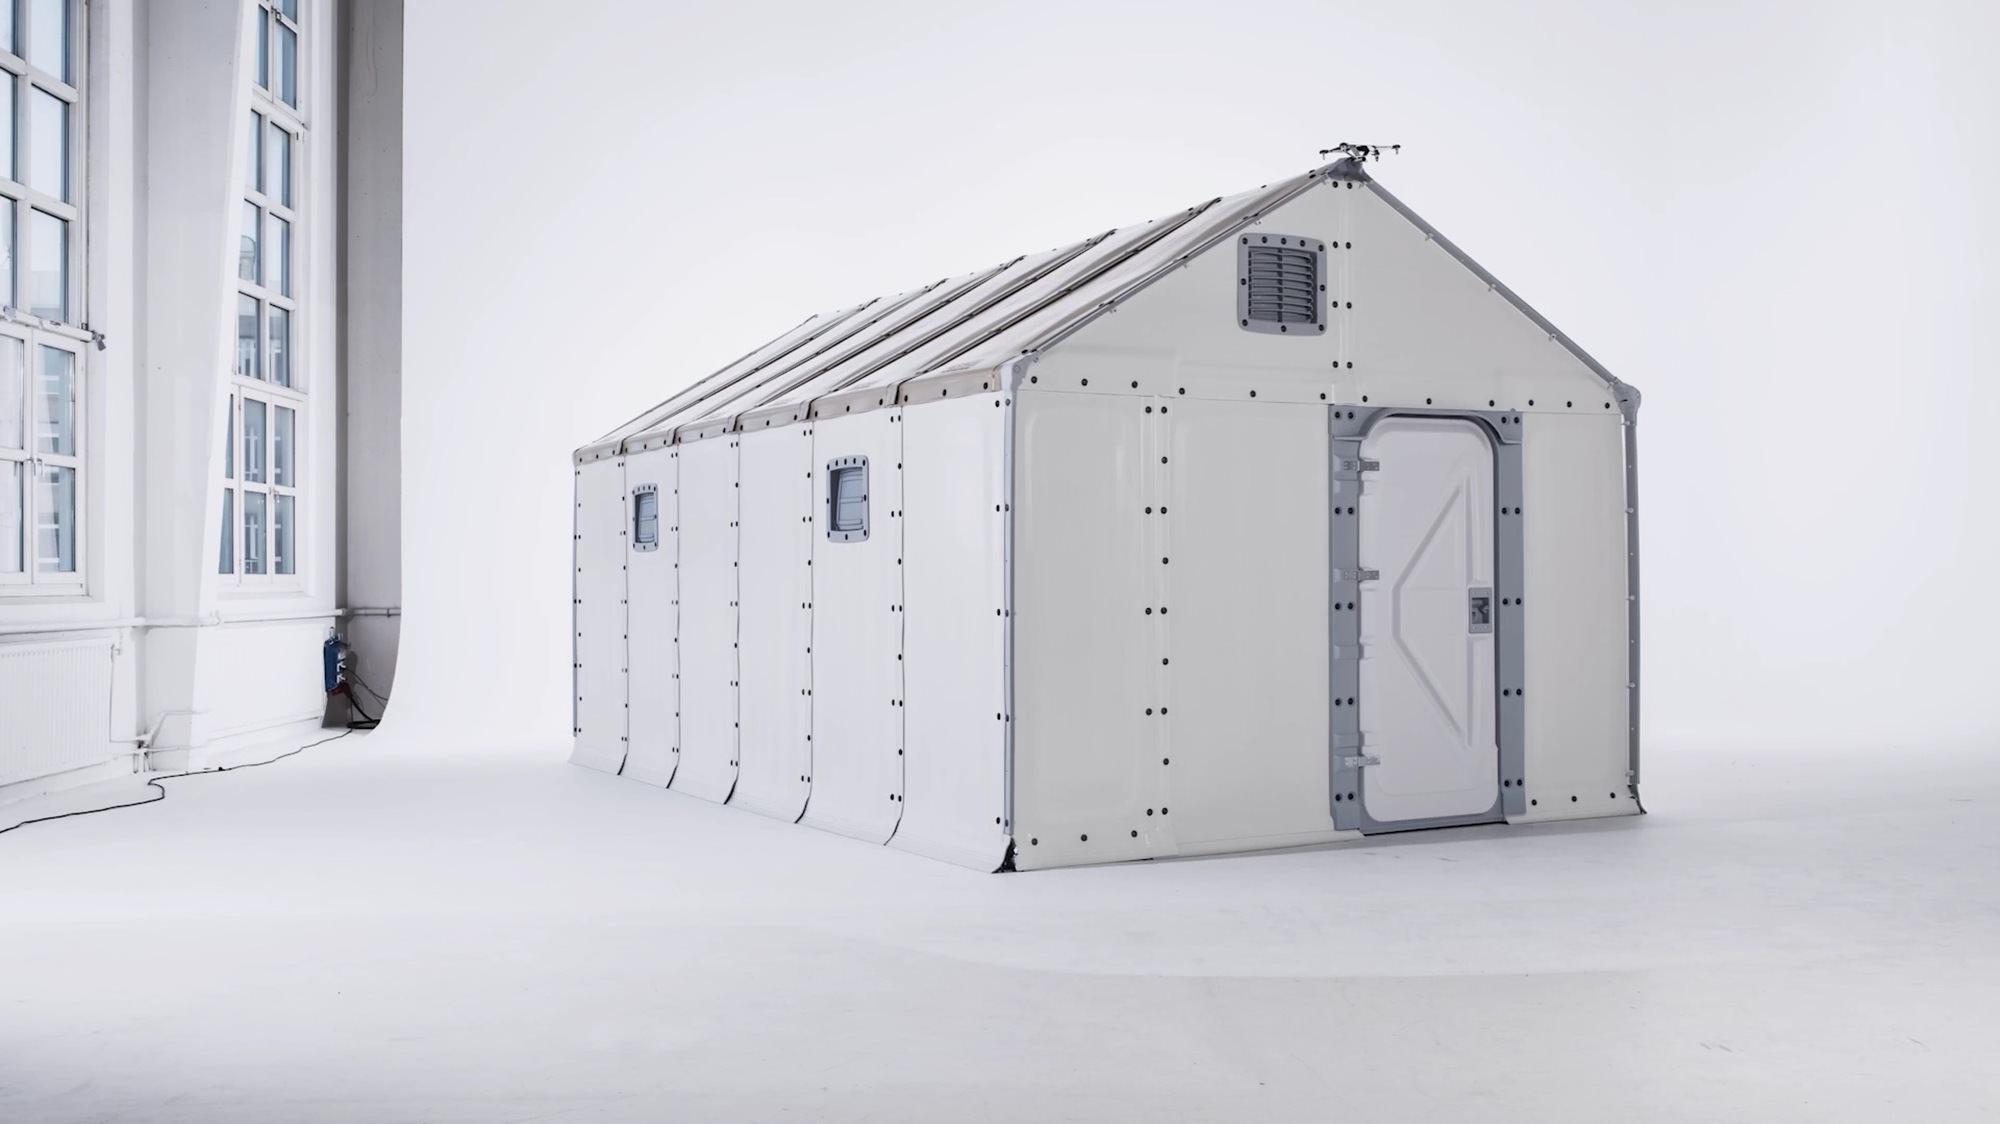 better shelters